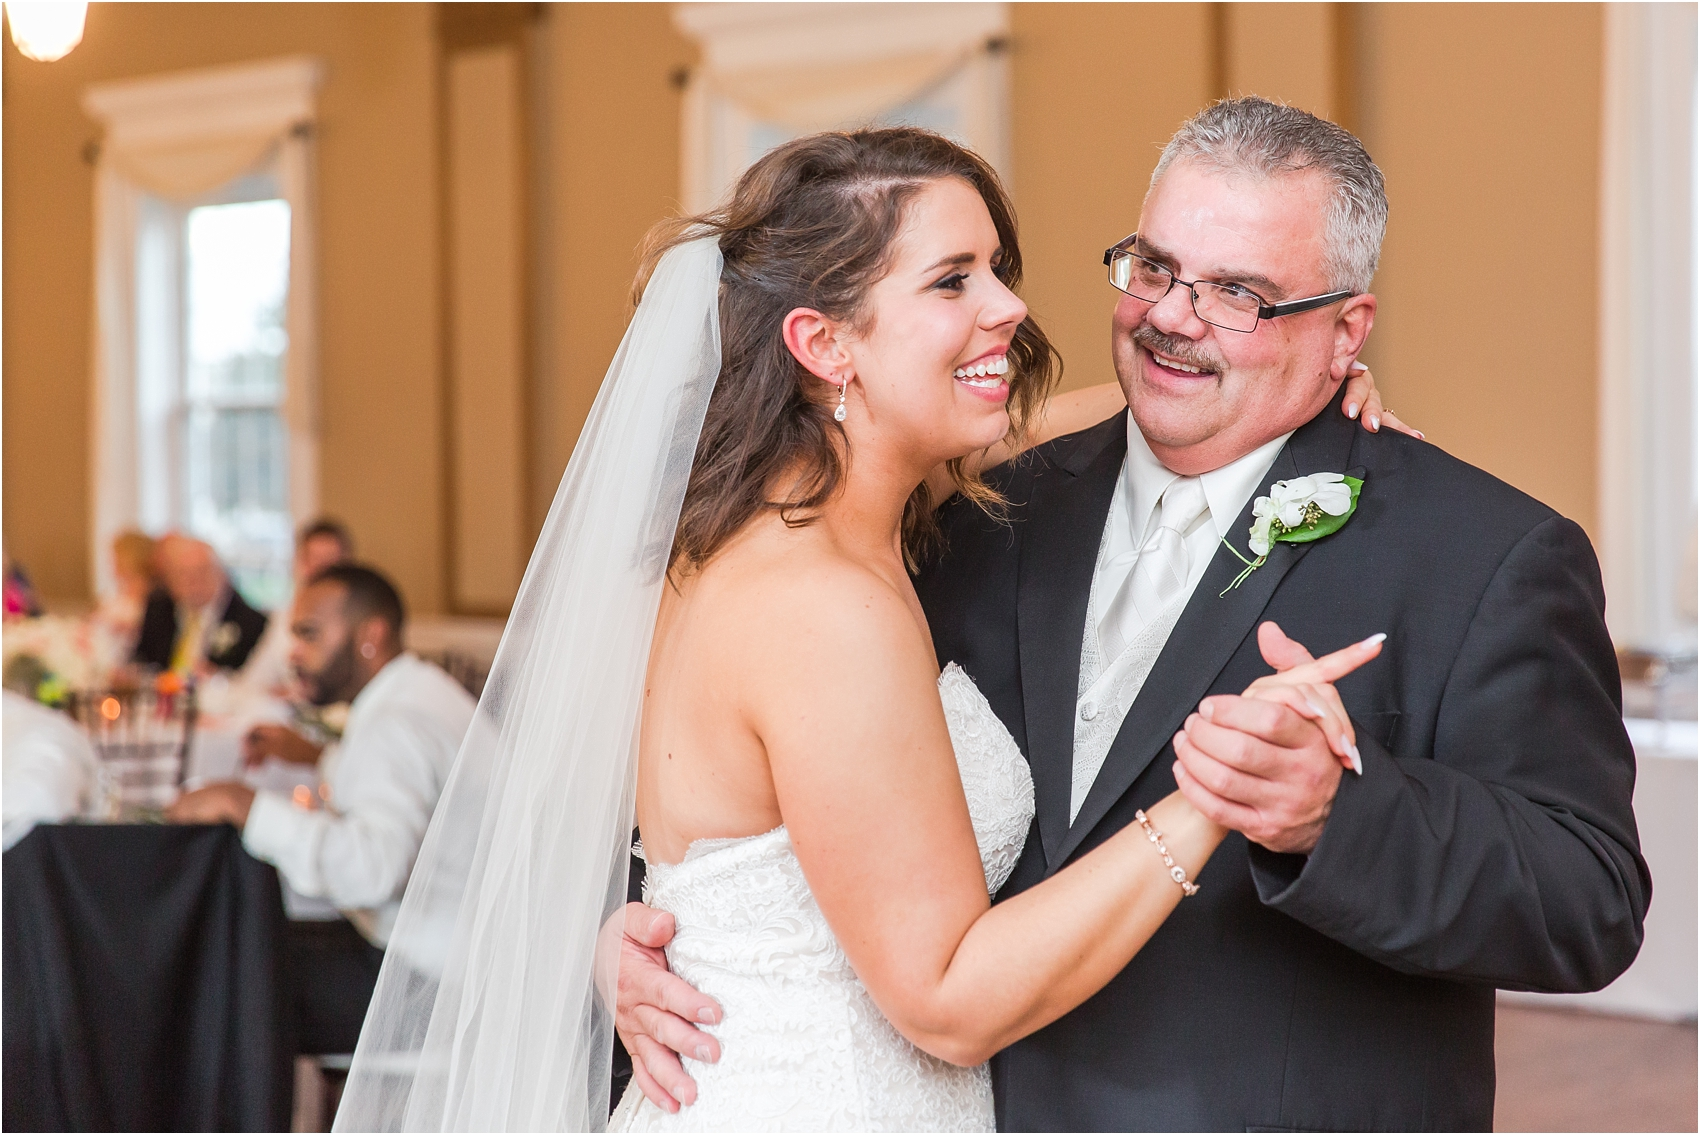 elegant-and-romantic-fall-wedding-photos-at-st-marys-catholic-church-in-monroe-michigan-by-courtney-carolyn-photography_0073.jpg